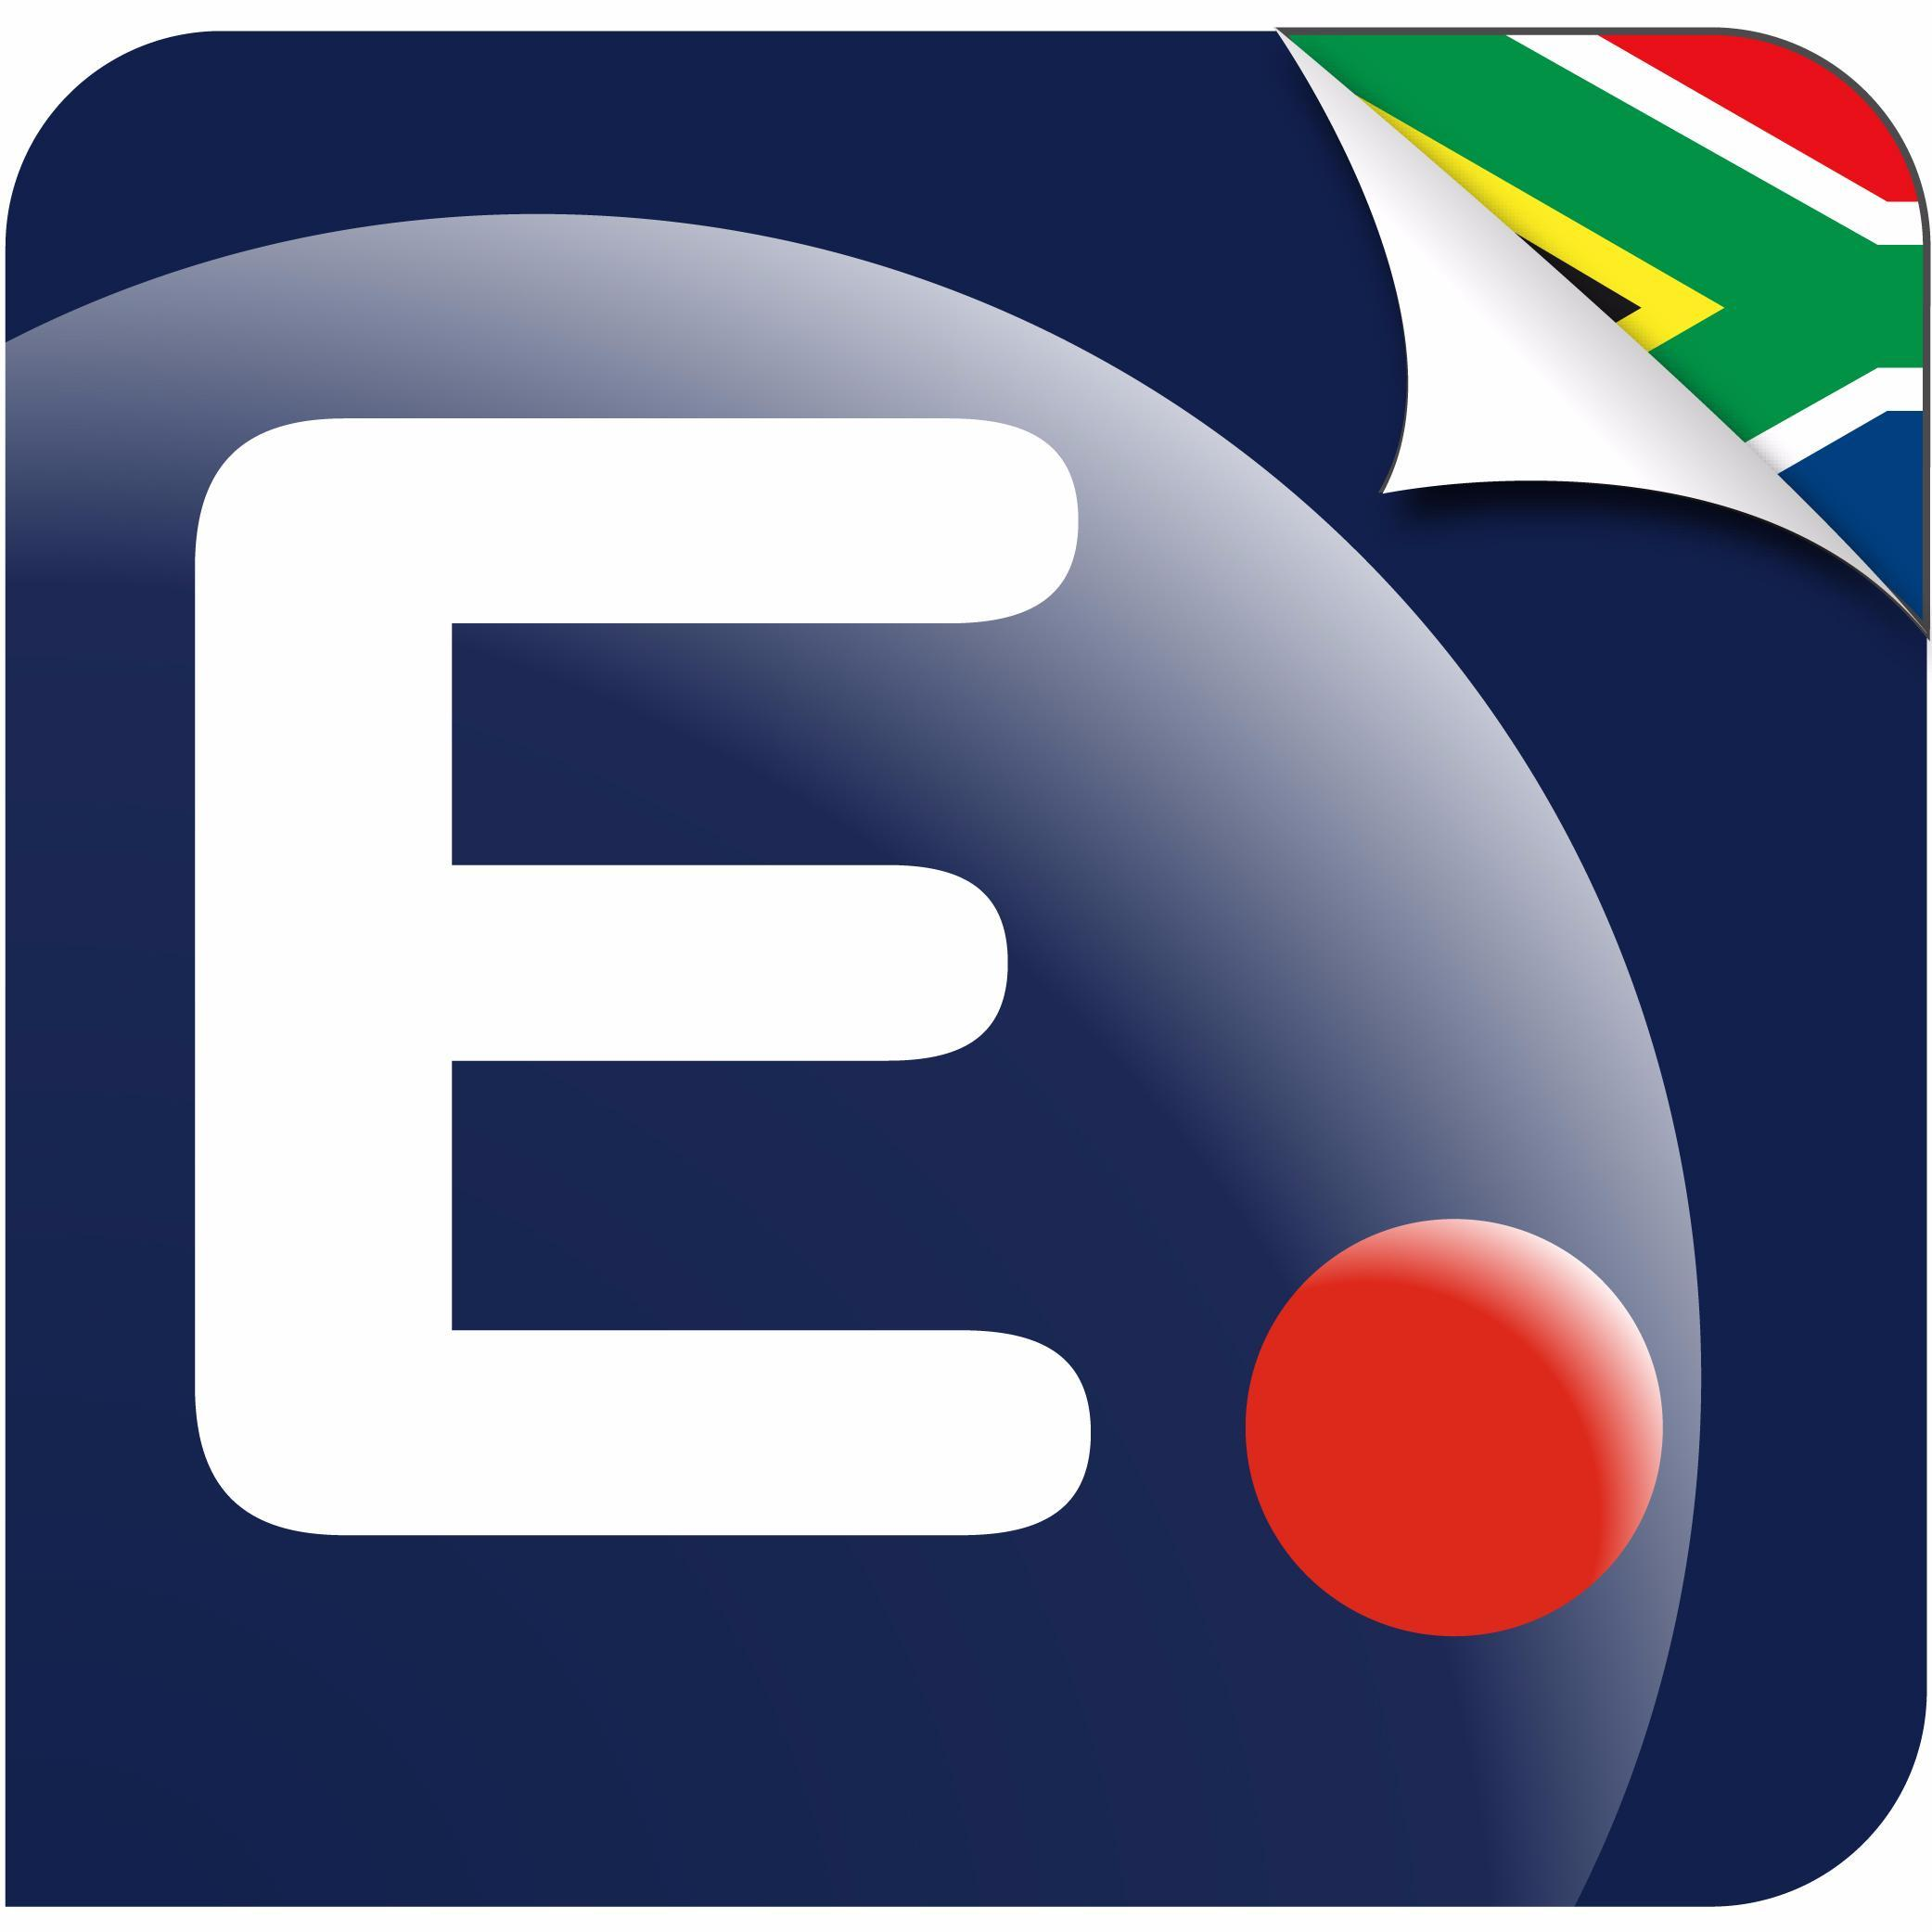 Edenred South Africa (@Edenred_SA).